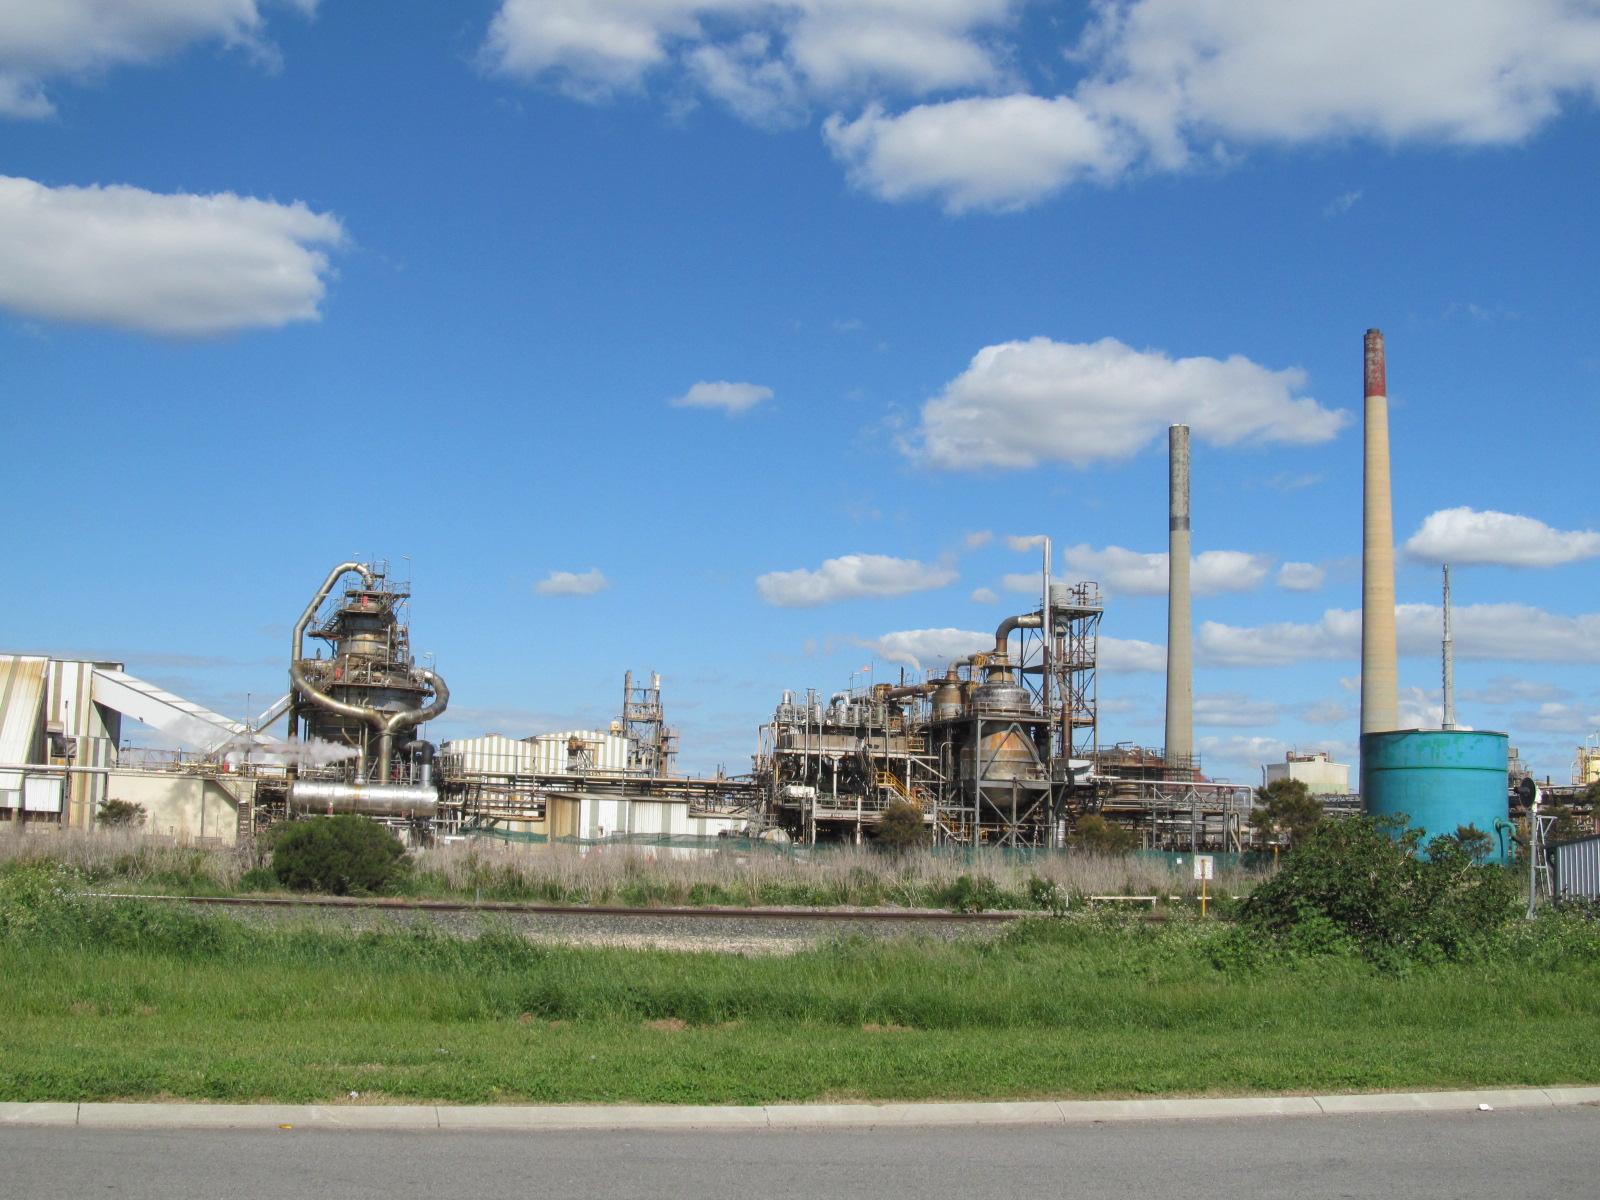 File:Kwinana Nickel Refinery N1 jpg - Wikimedia Commons